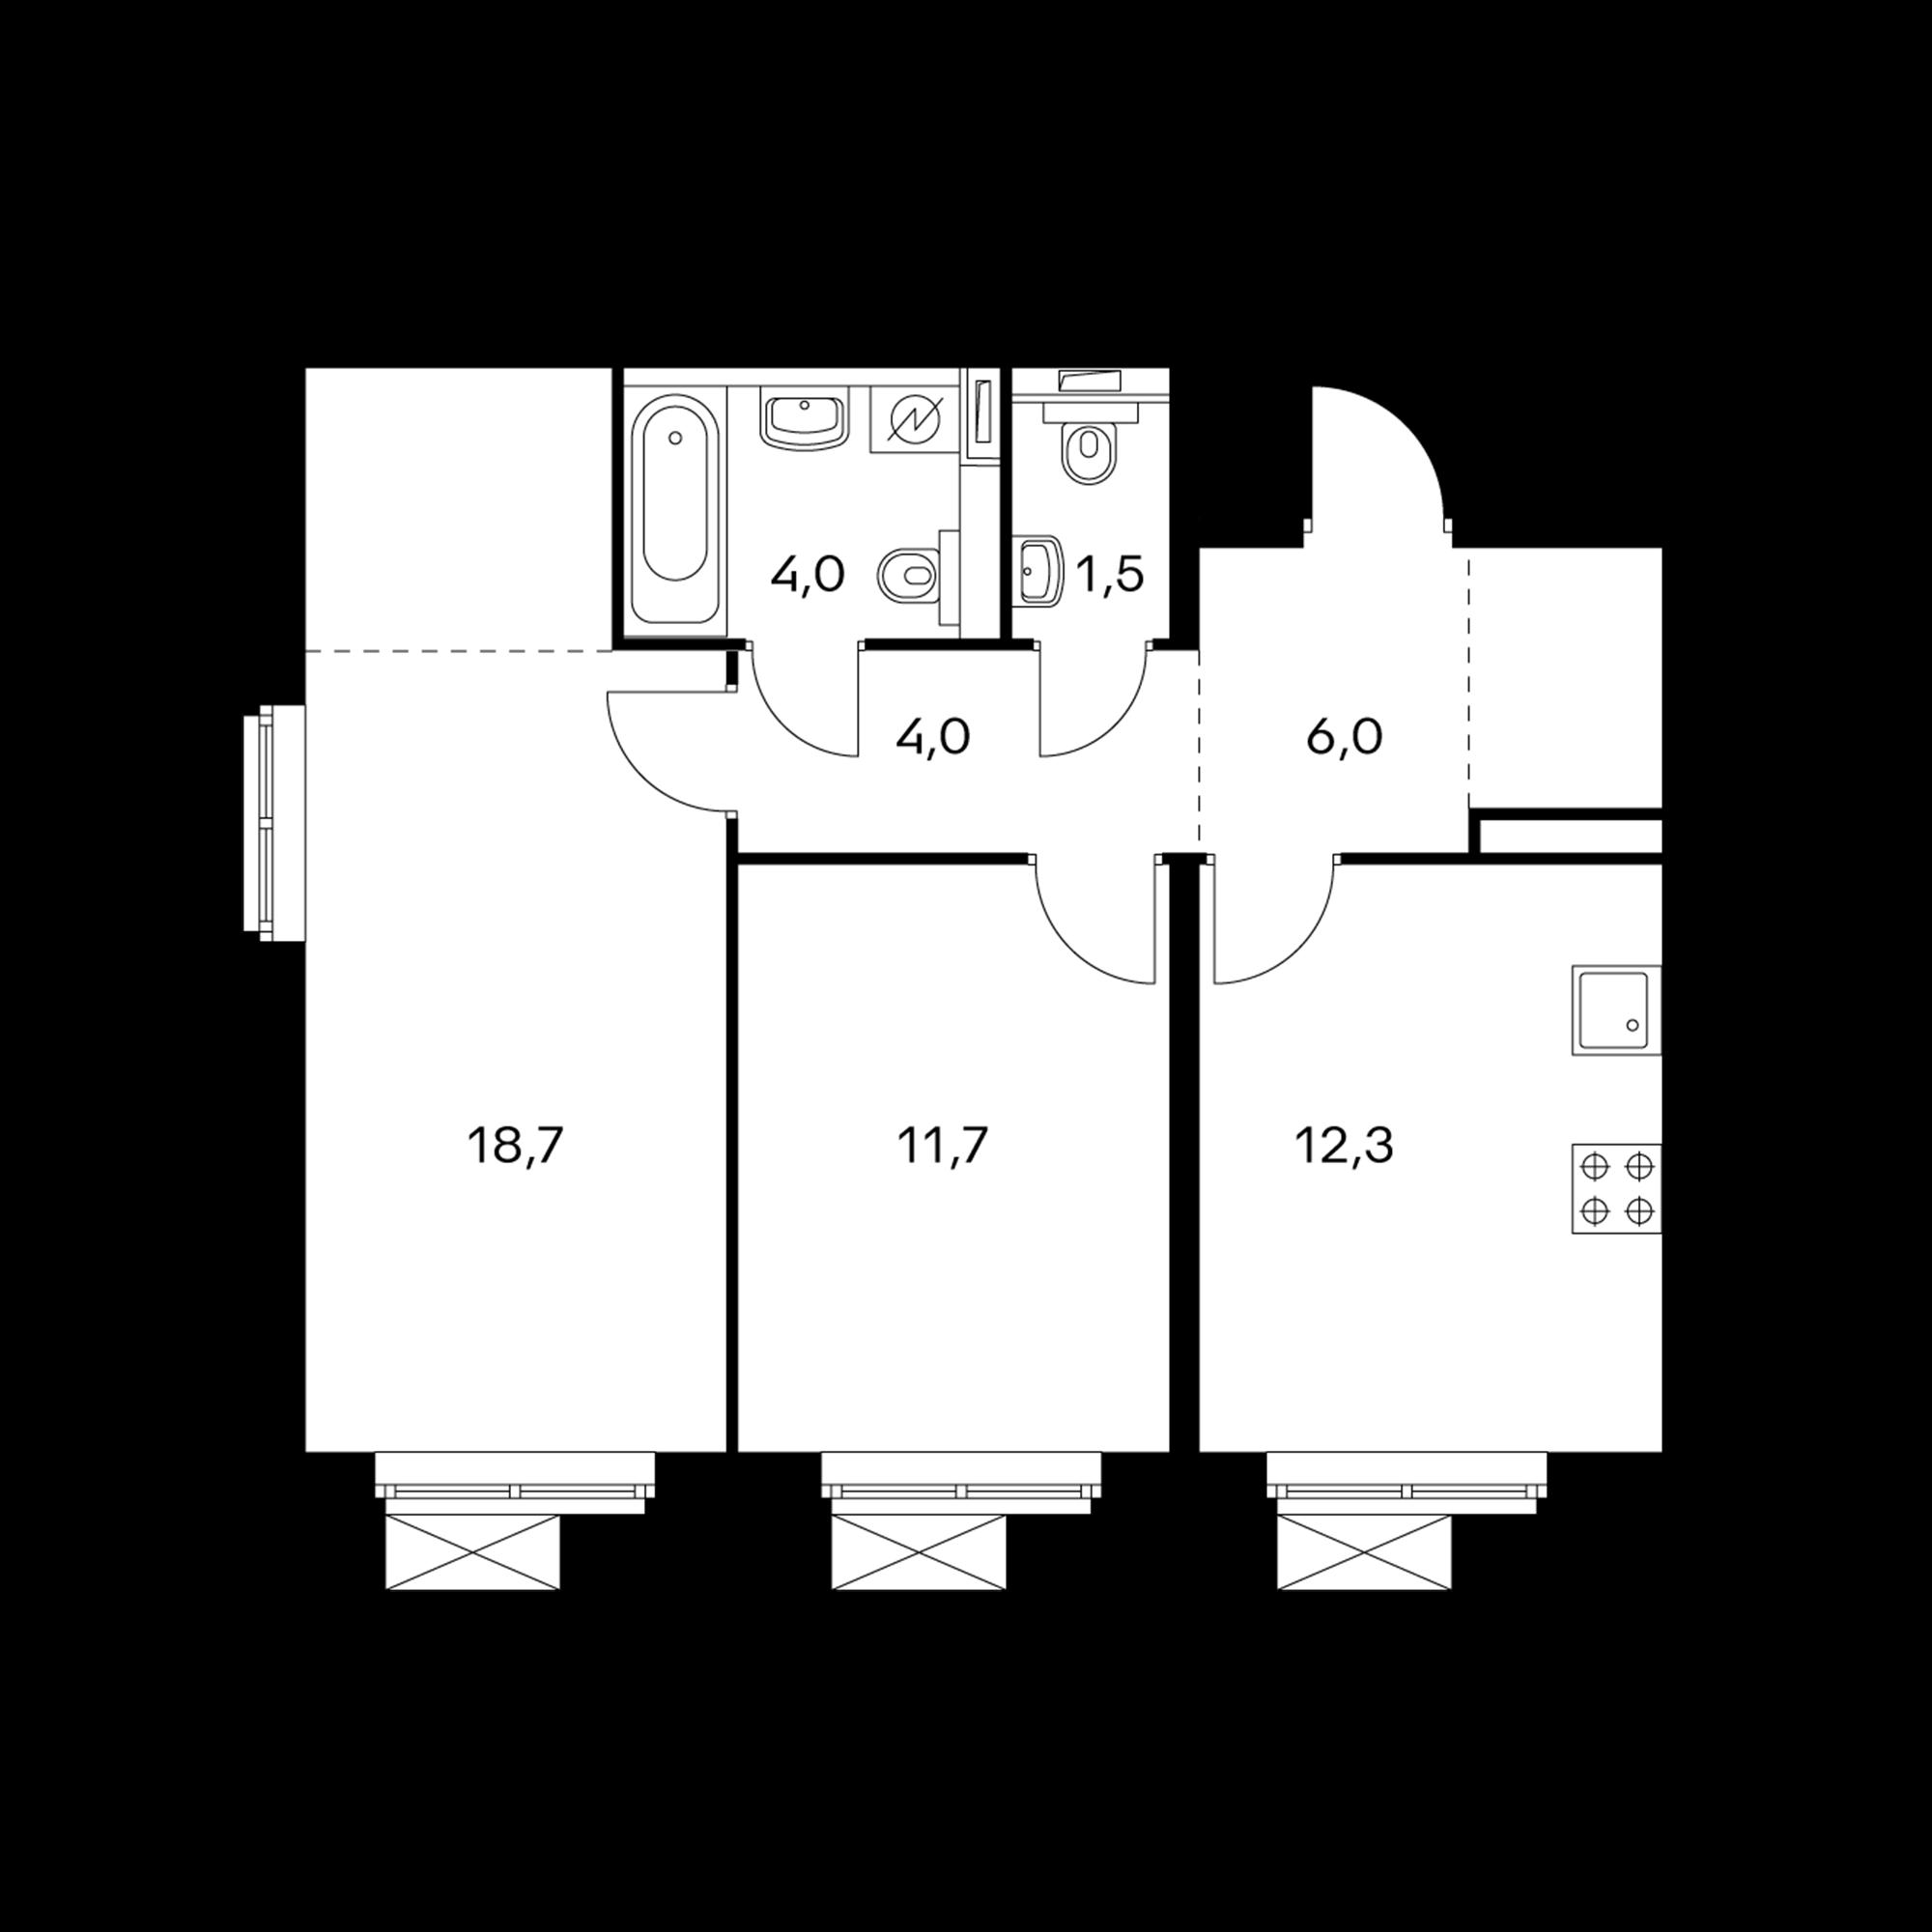 2KM4_9.3-1